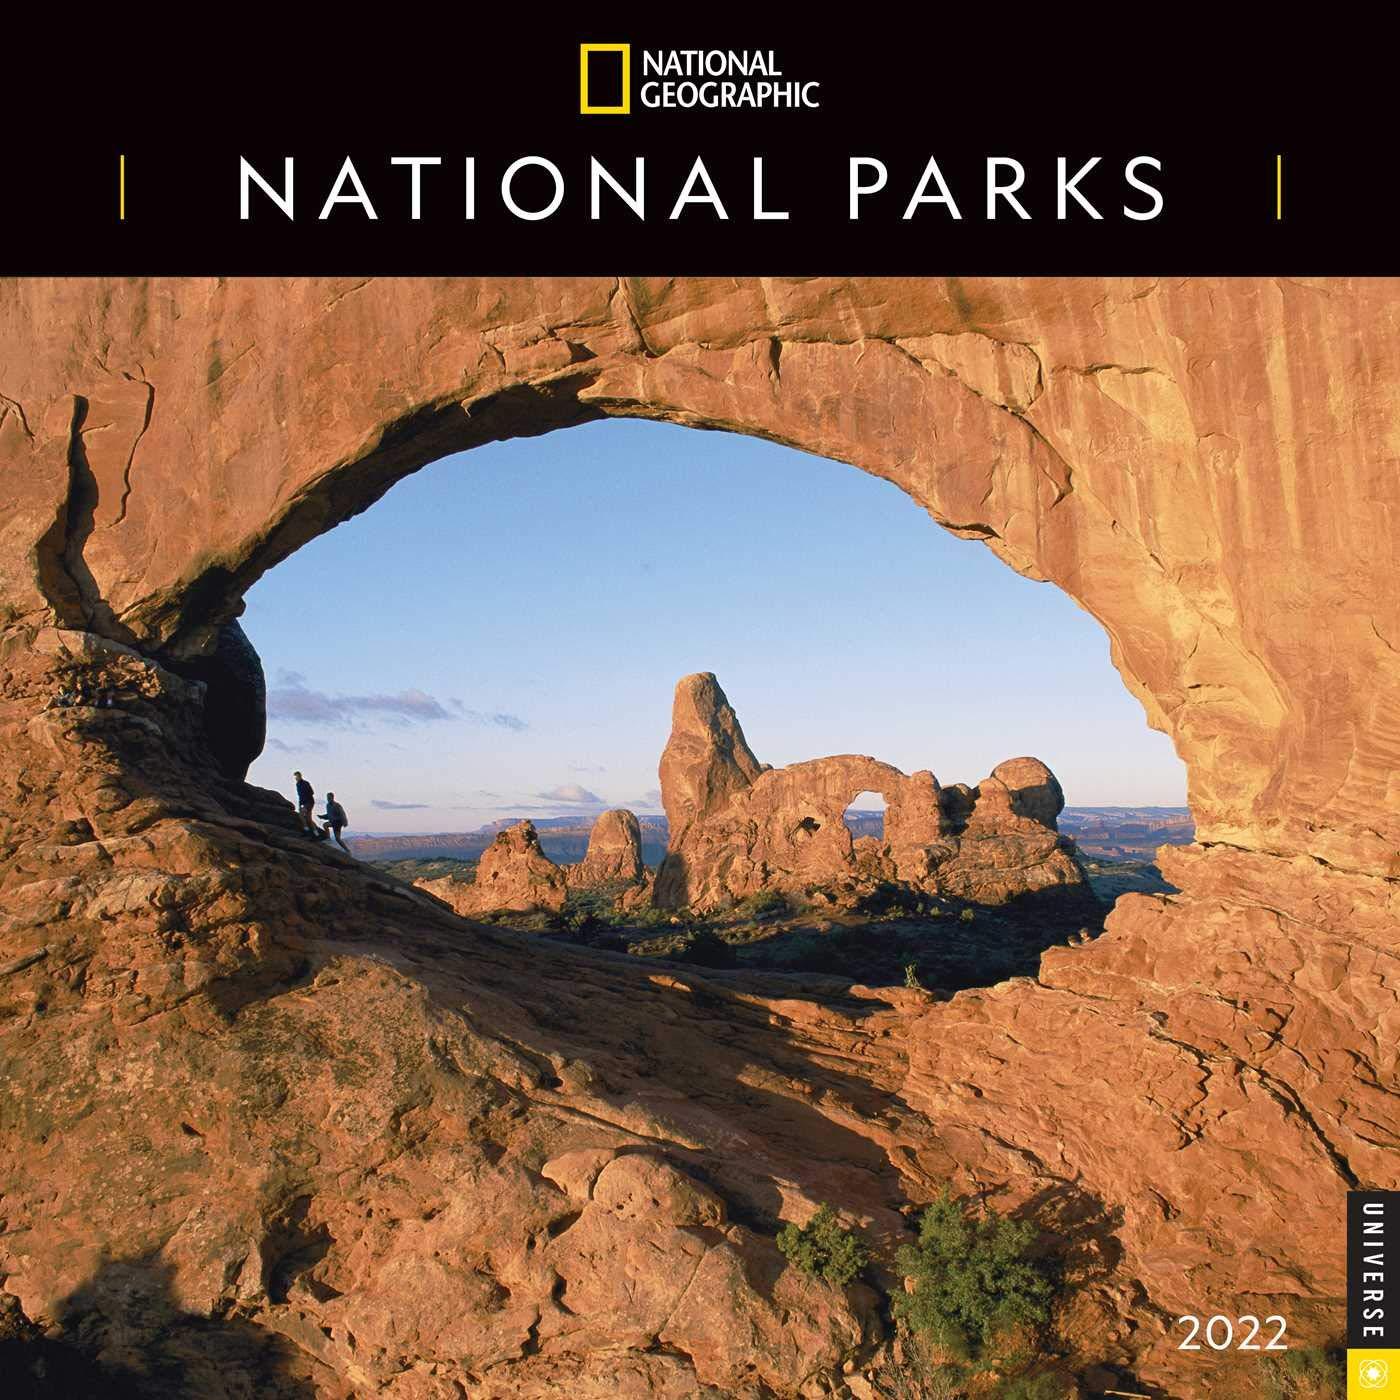 National Parks Calendar 2022.National Geographic National Parks 2022 Wall Calendar Amazon In National Geographic Books